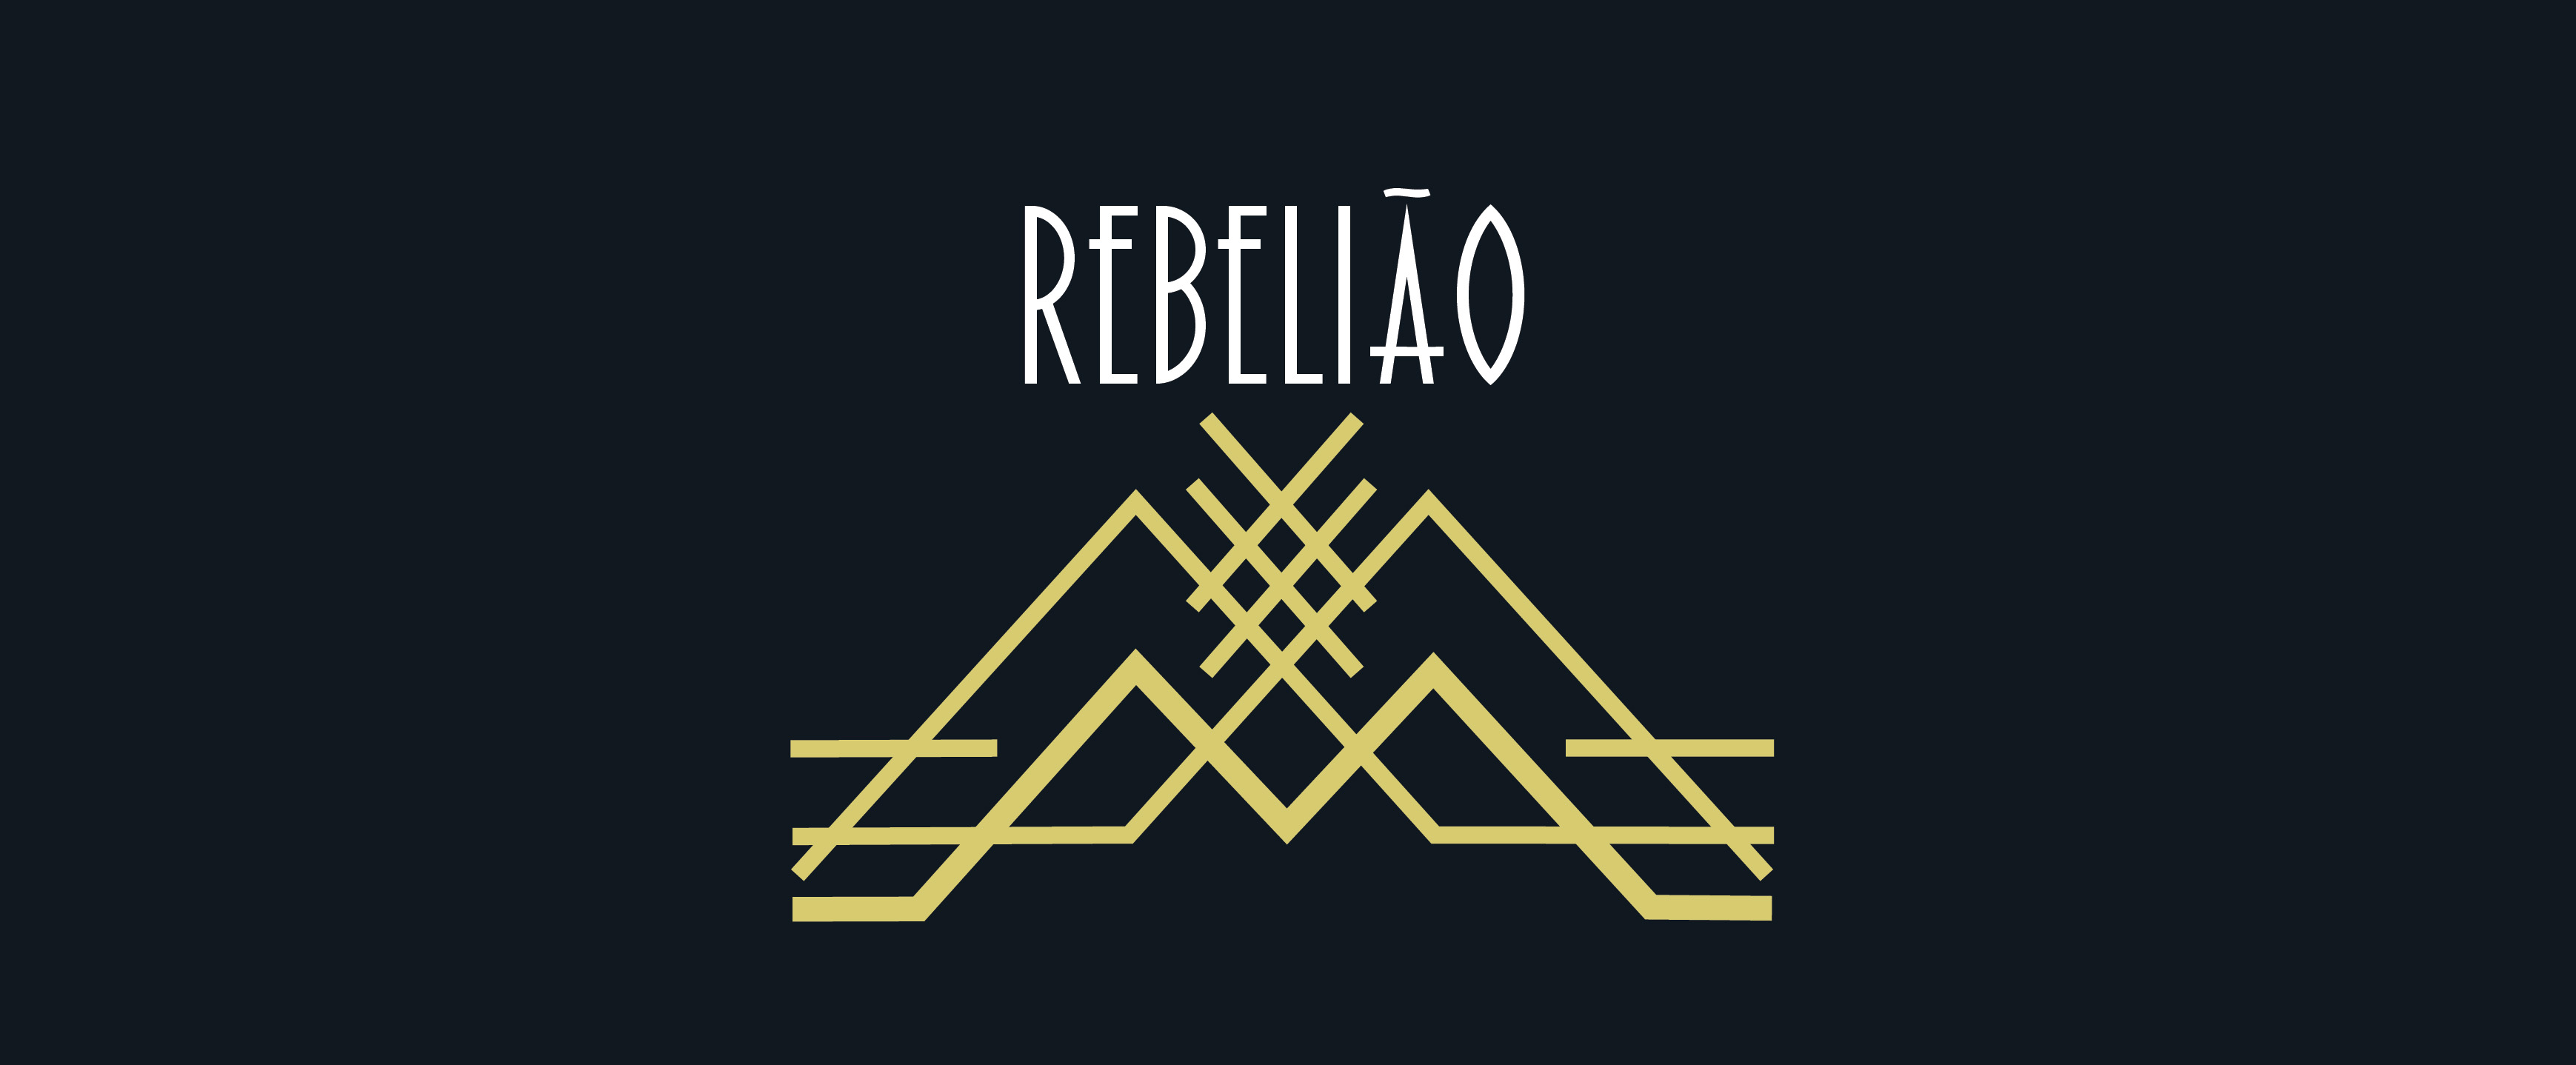 Rebelião M